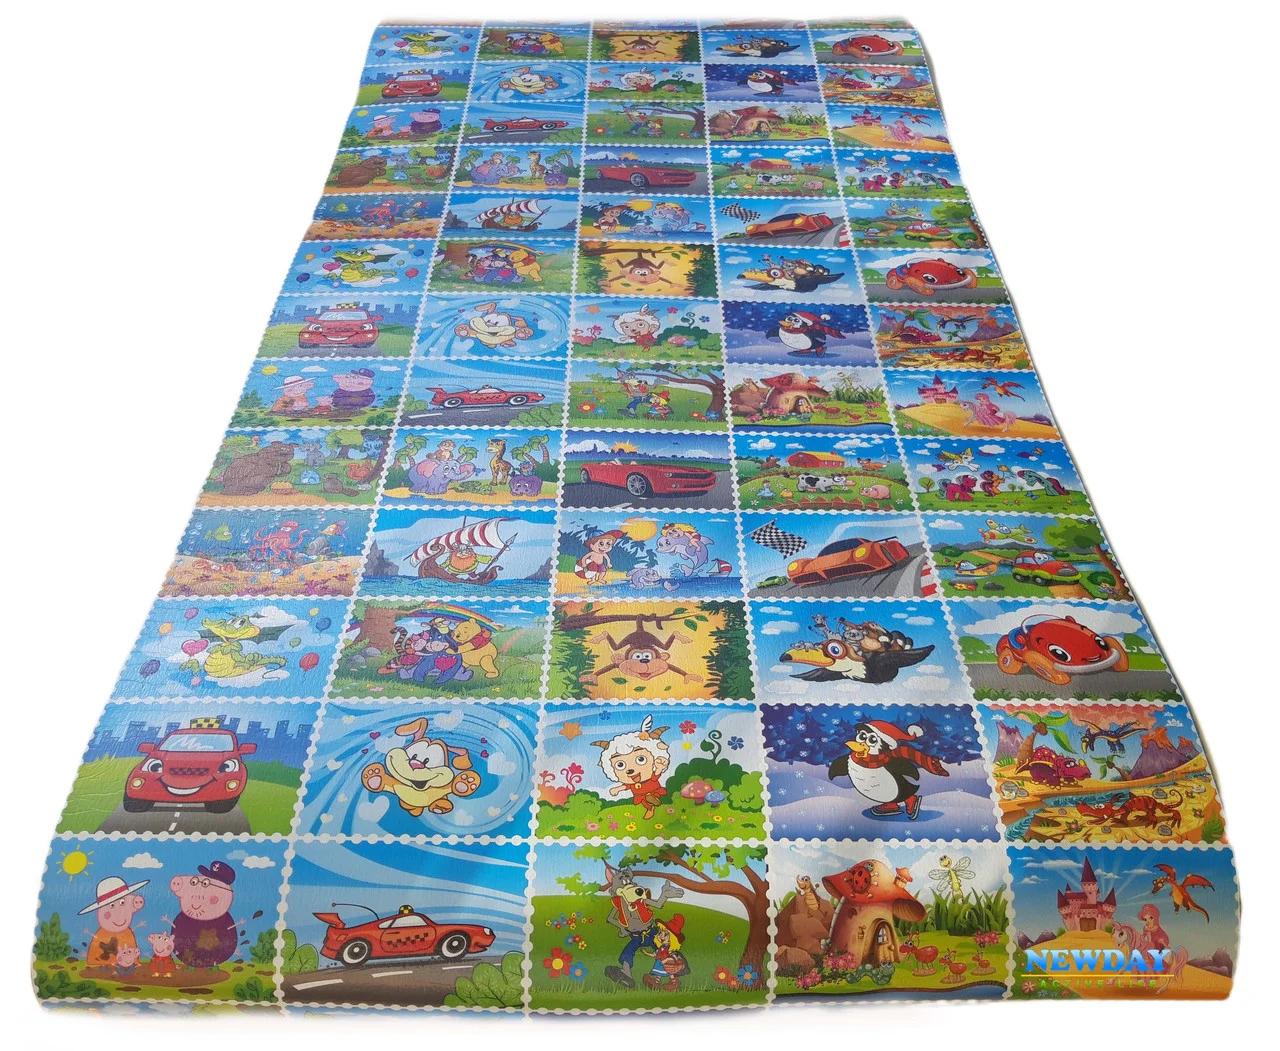 Детский коврик 1900х960х8мм теплоизоляционный, развивающий, игровой коврик